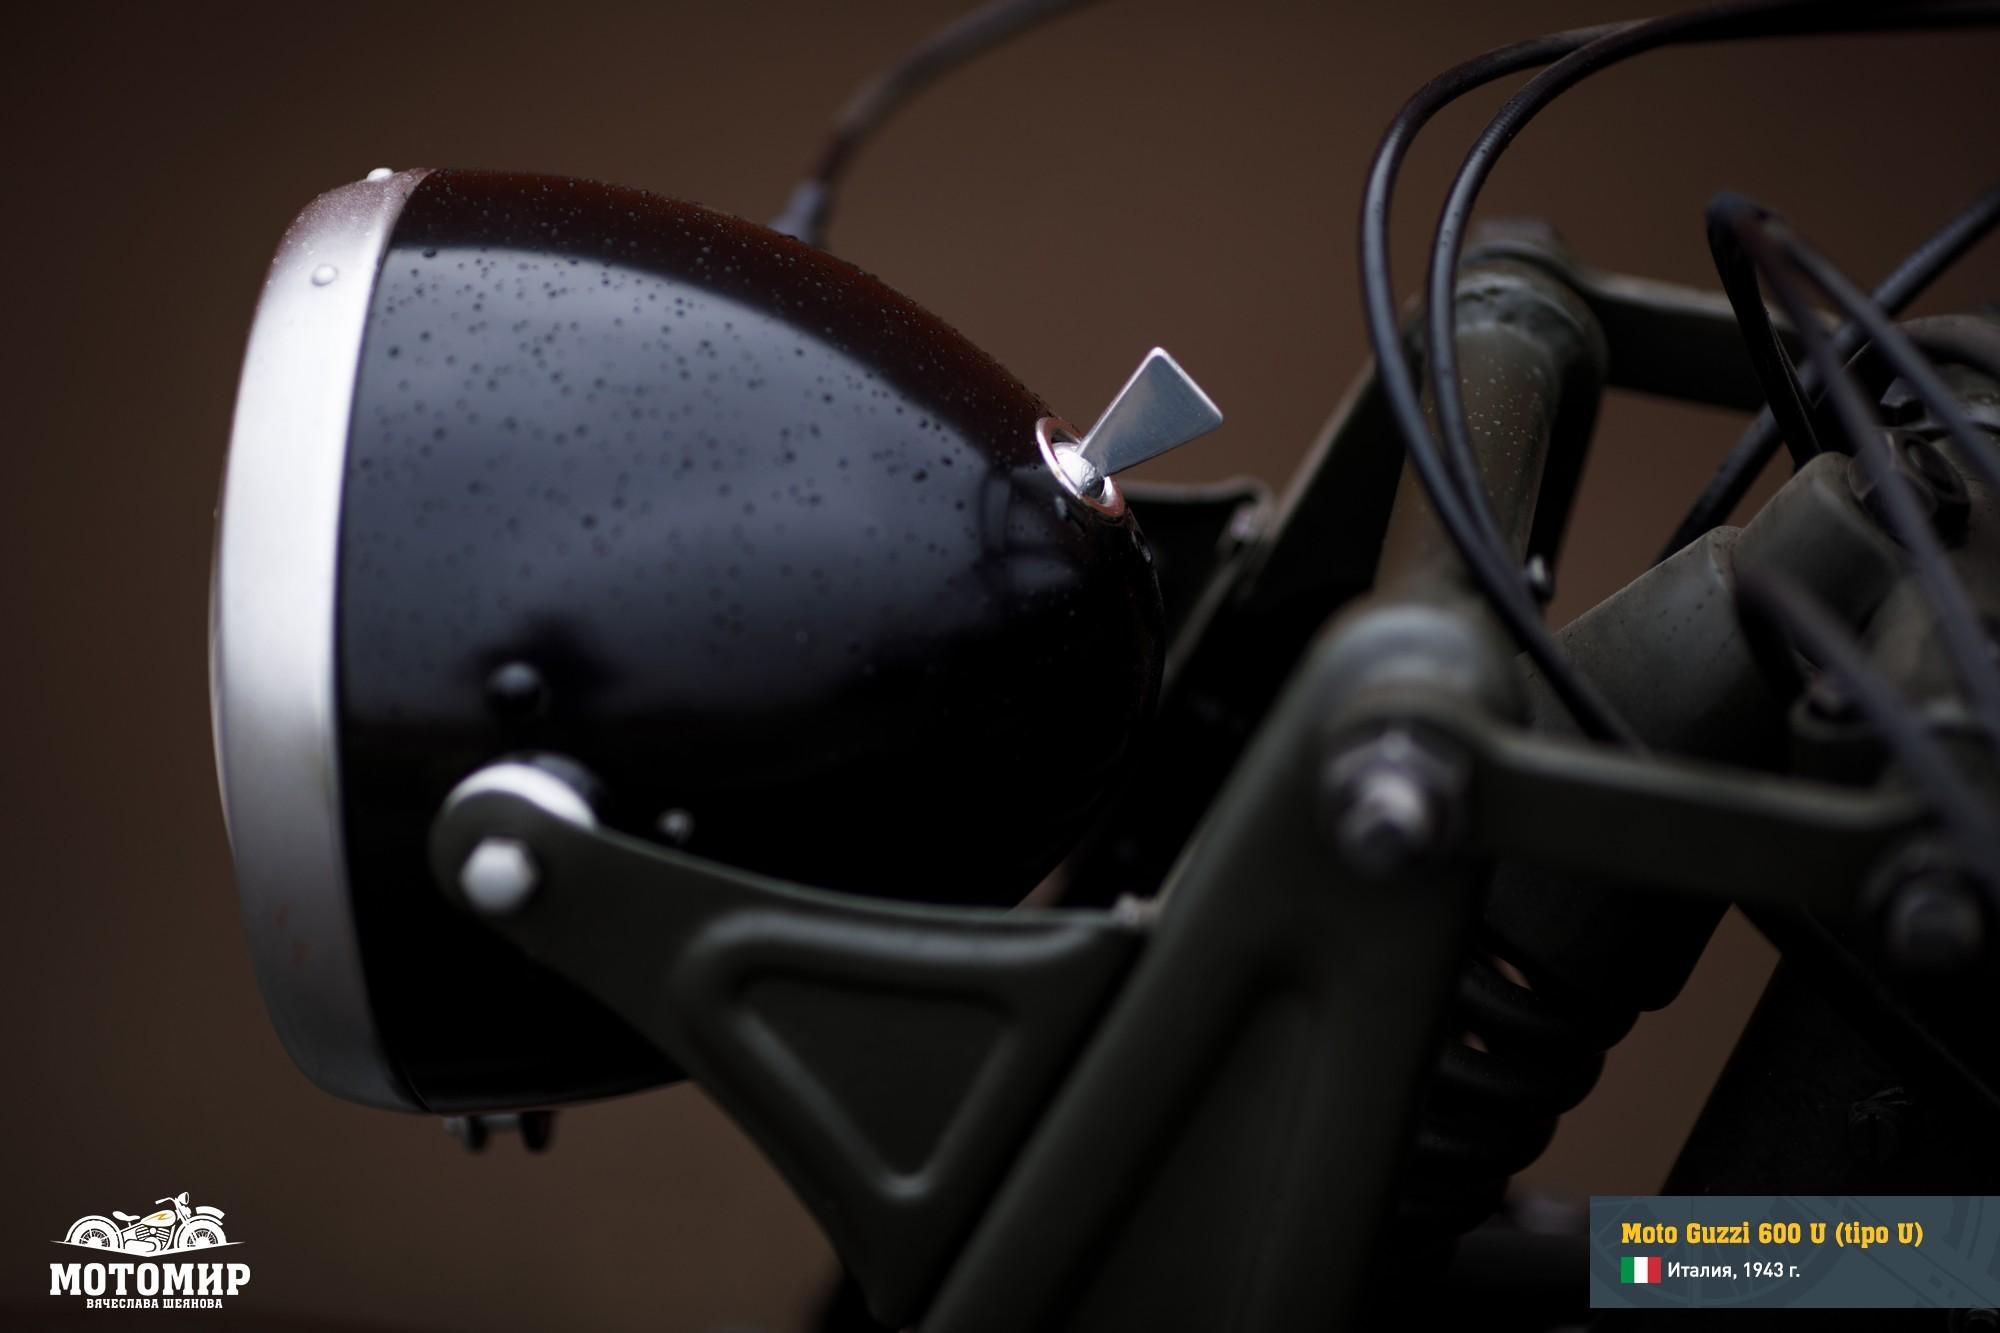 moto-guzzi-600-u-web-28